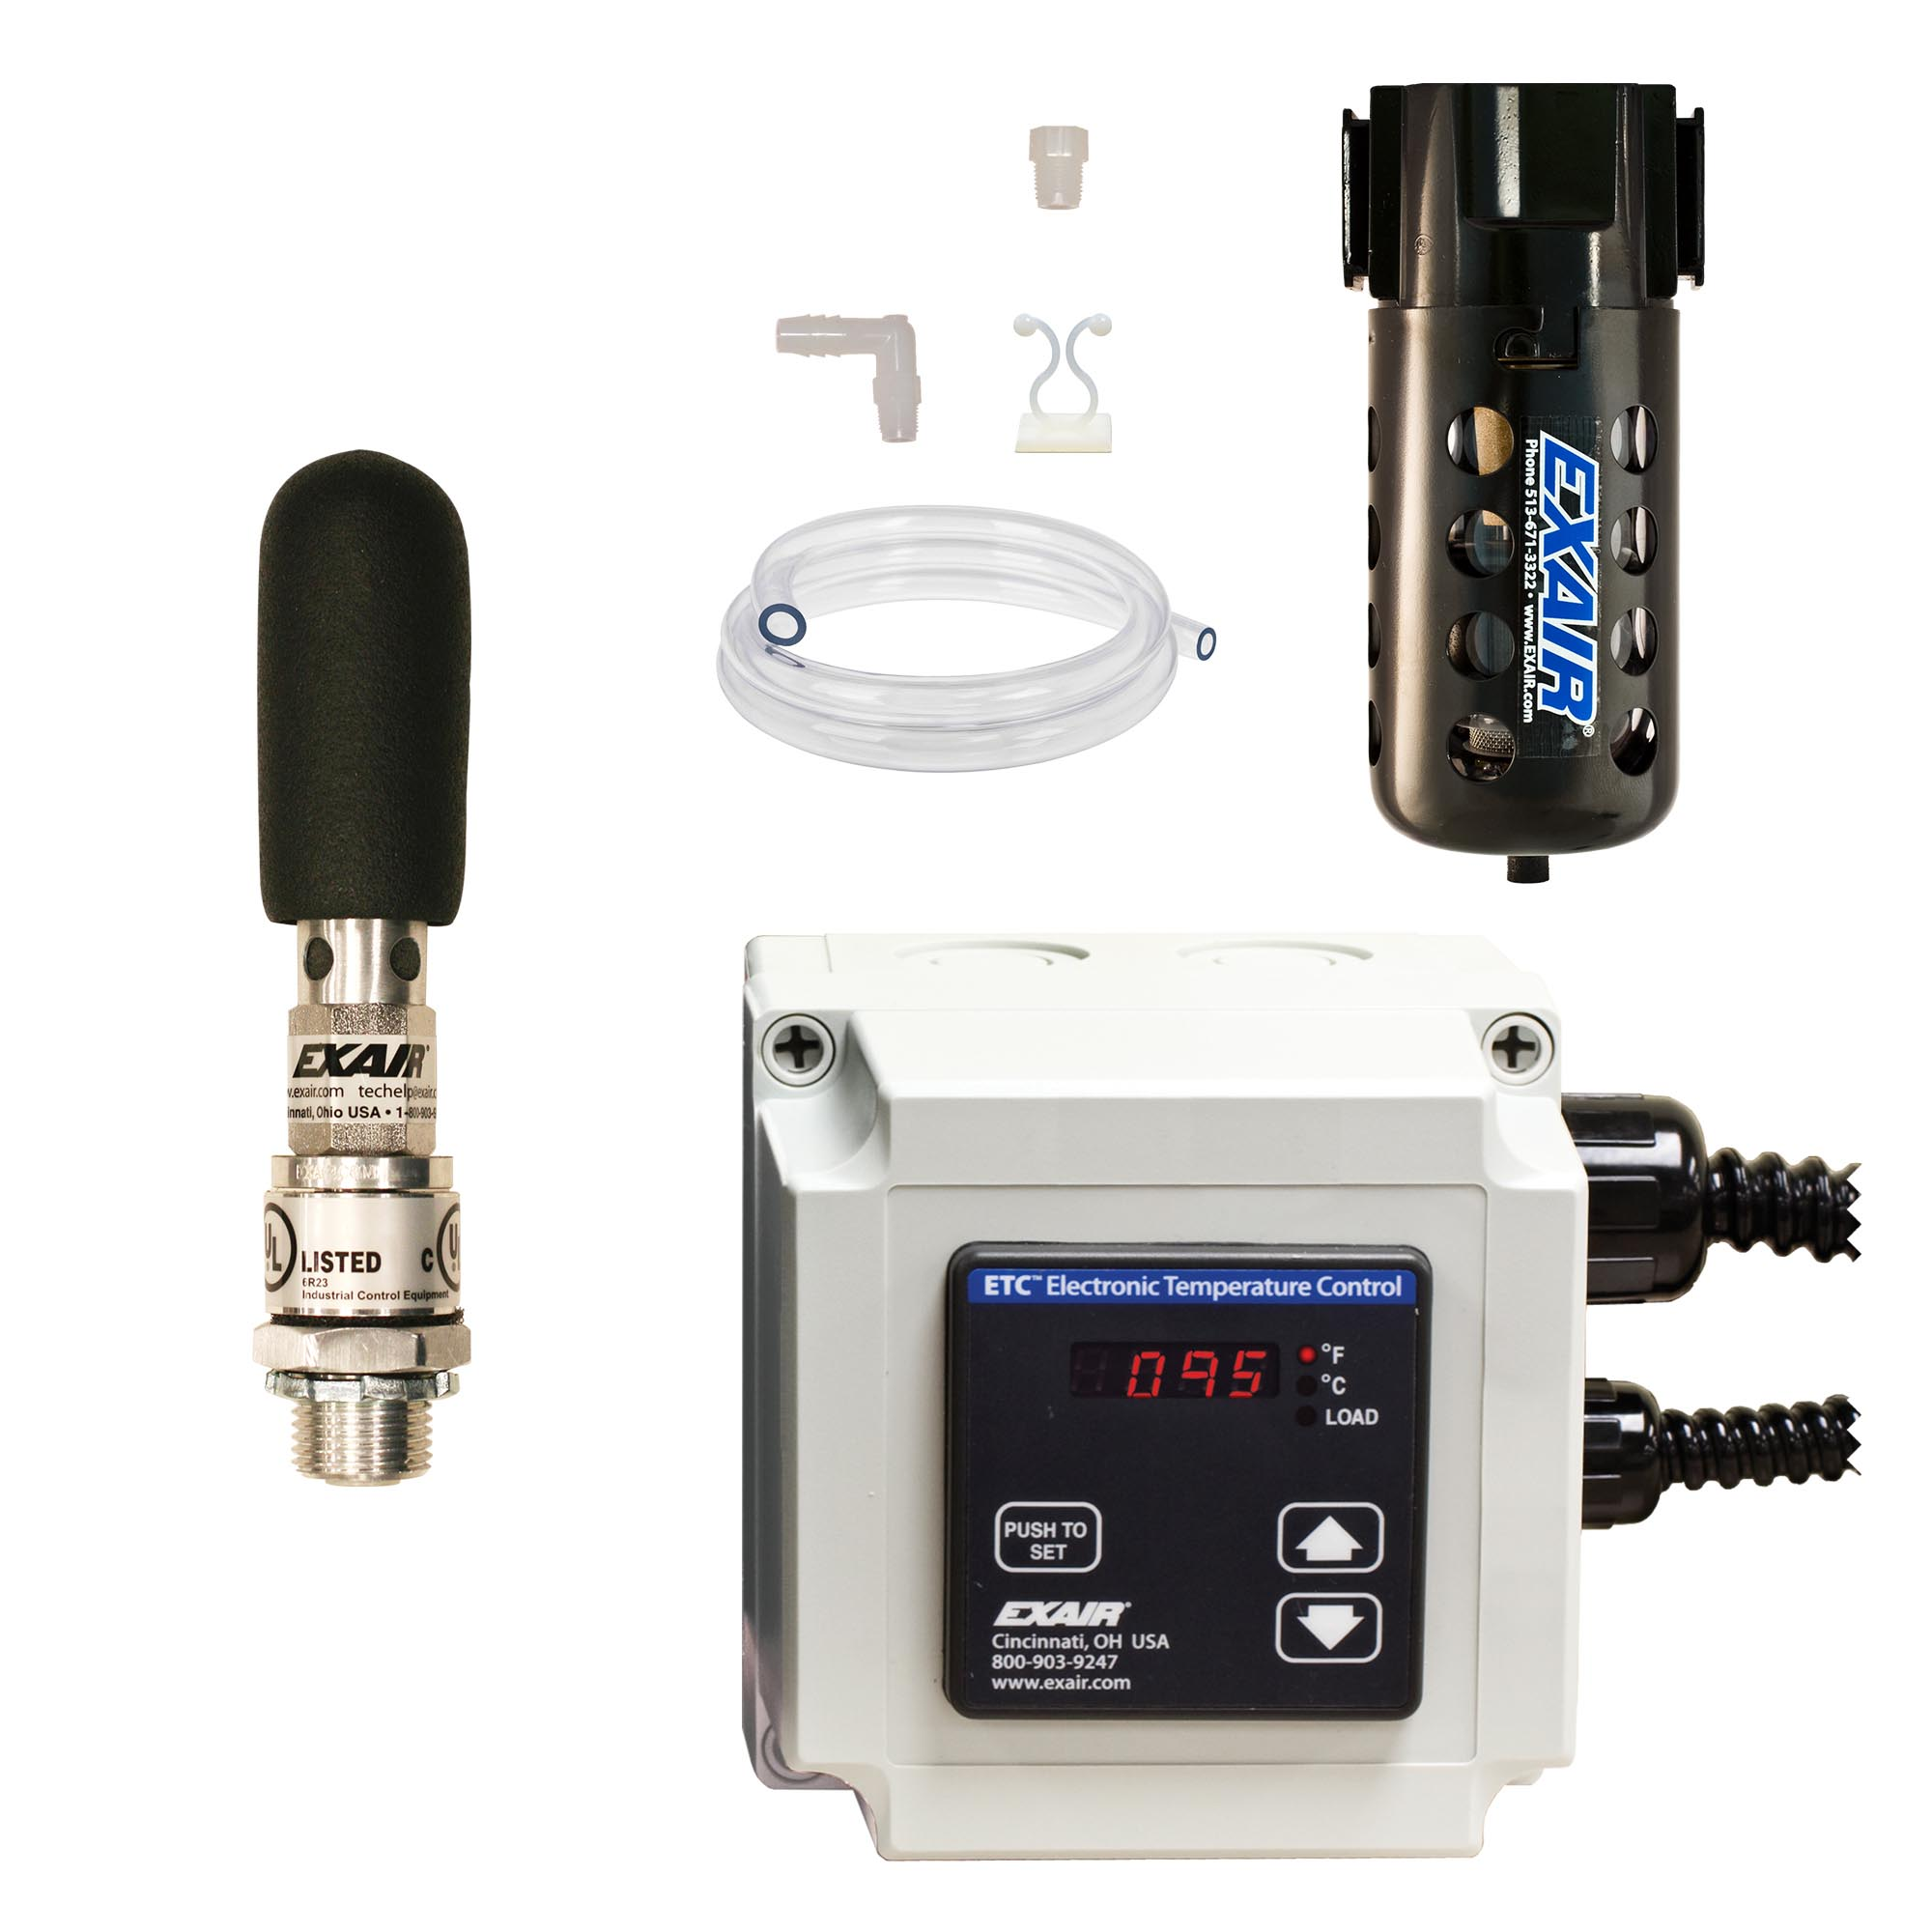 Model W4308-ETC120 NEMA 12 550 Btu/hr Cabinet Cooler System with ETC Thermostat Control, 120V